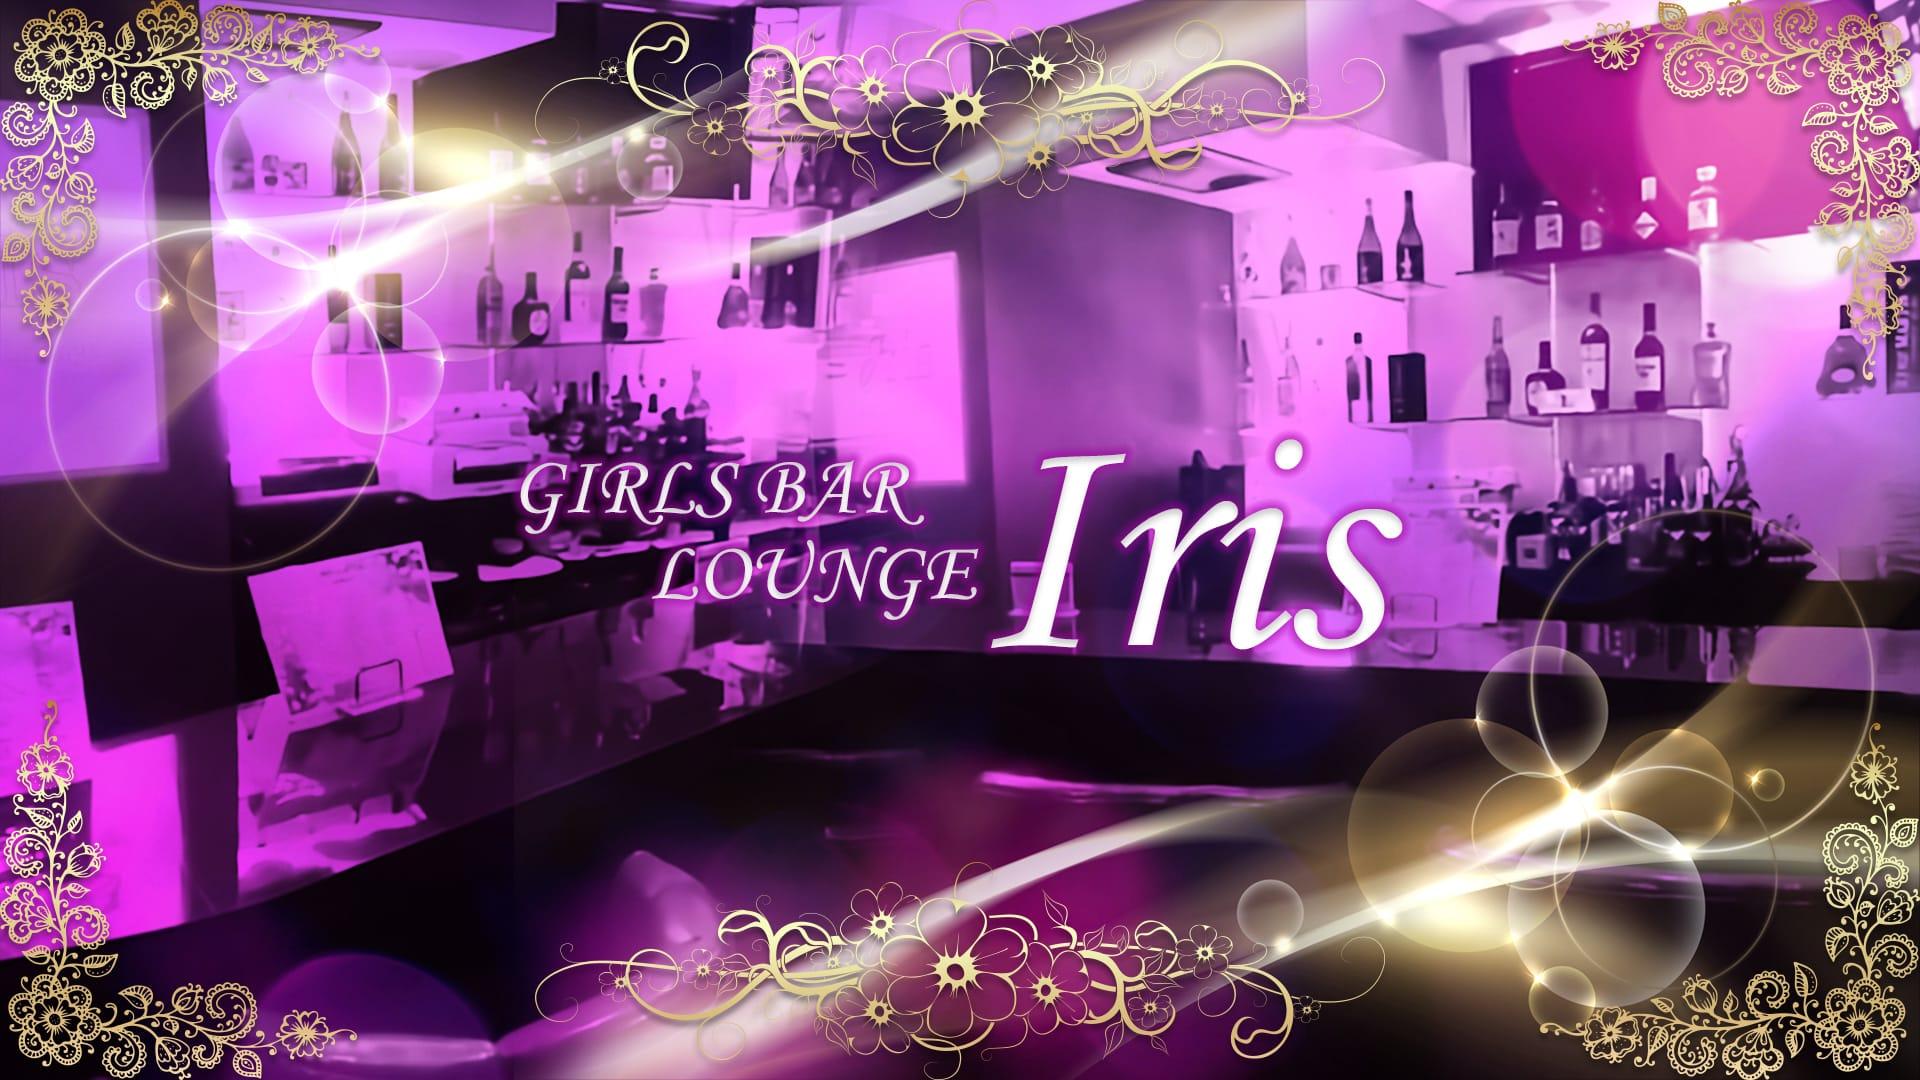 GIRLS BAR LOUNGE Iris <イリス> 吉祥寺 ガールズバー TOP画像